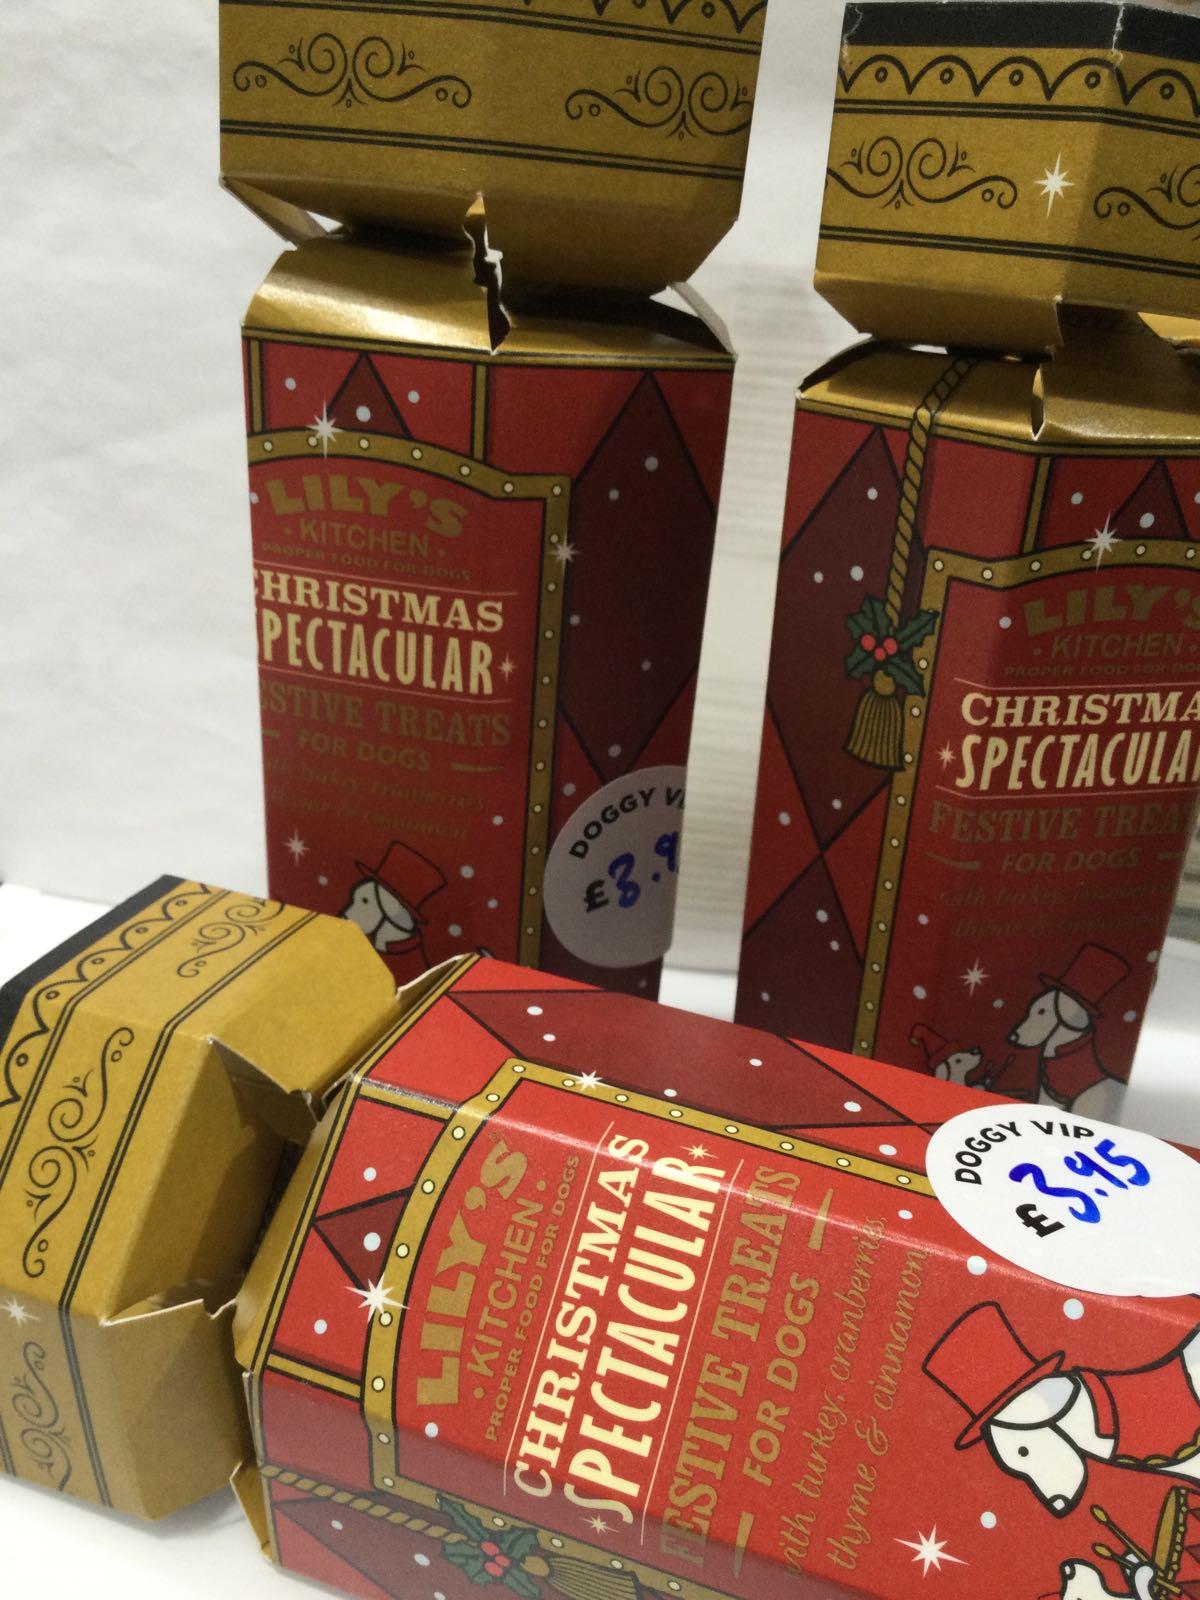 Lily's Kitchen- festive treats crackers